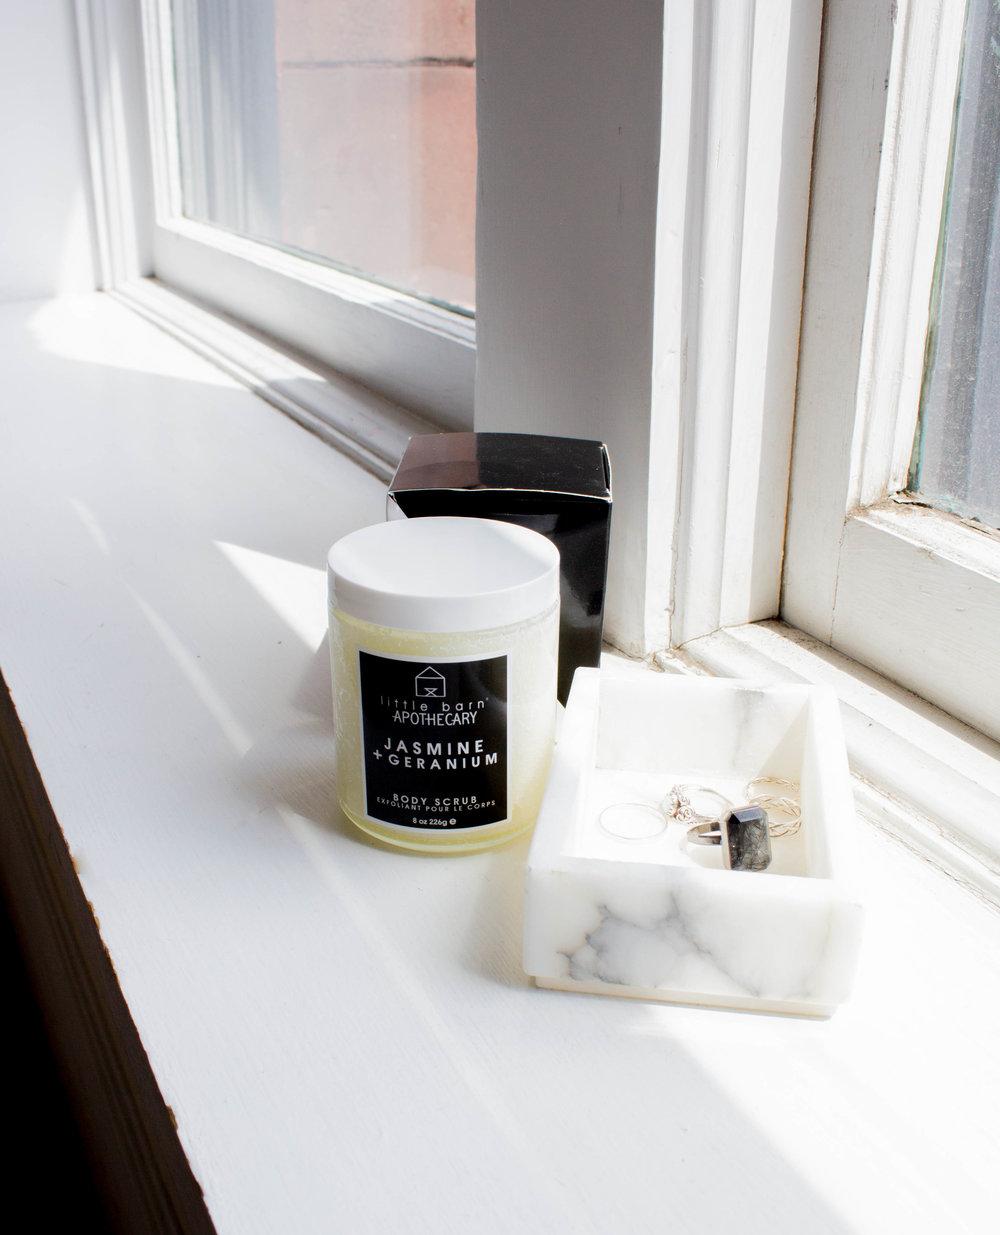 LITTLE BARN APOTHECARY    Jasmine+Geranium Polishing Body Scrub